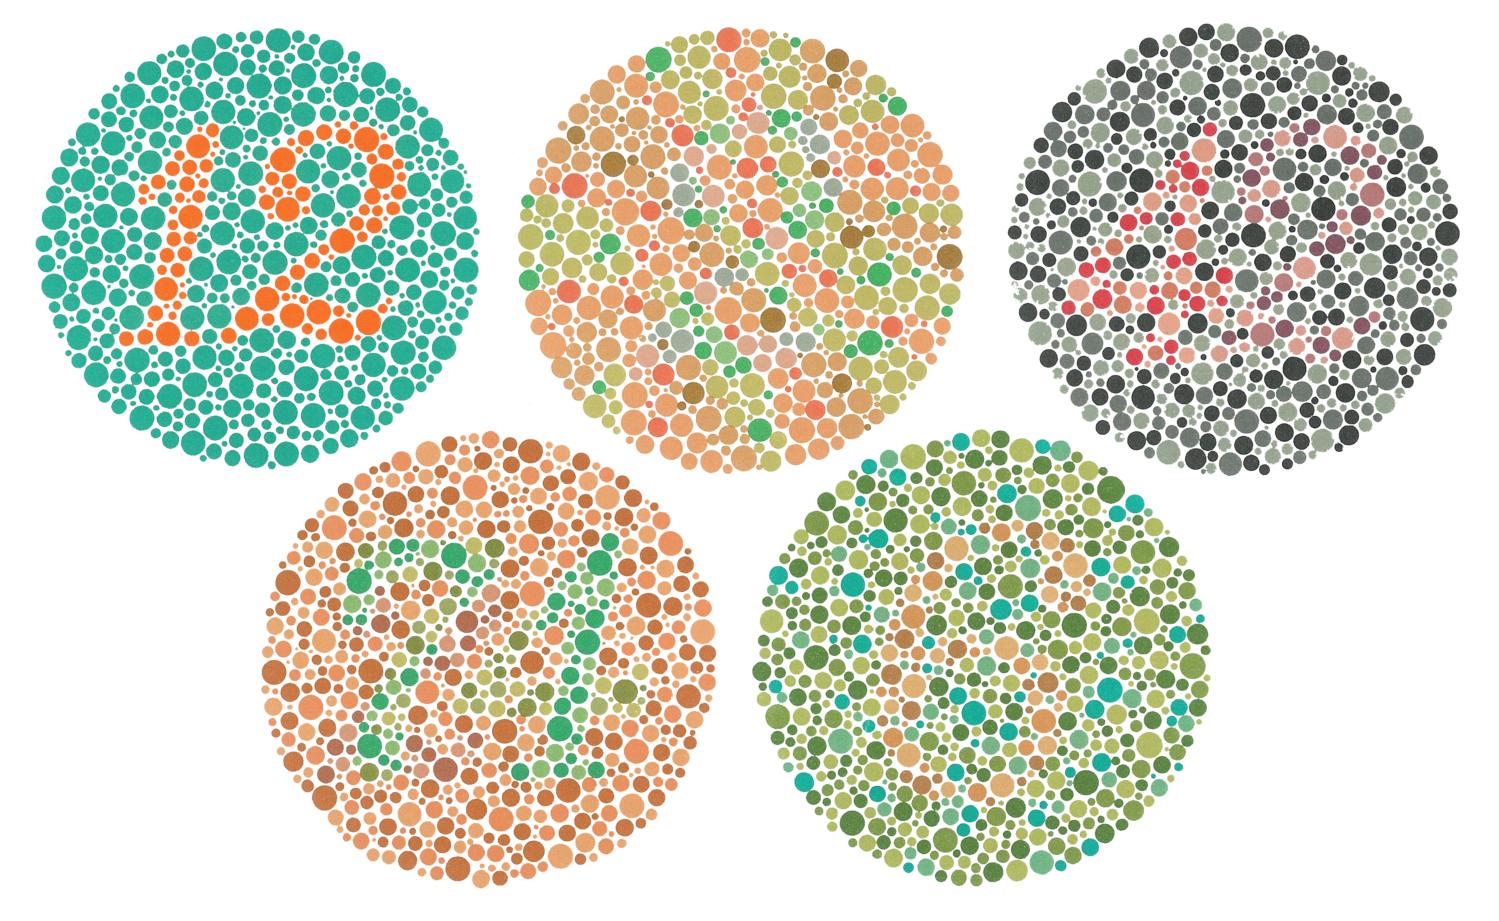 Tshirt design hide something as a ishihara color vision test